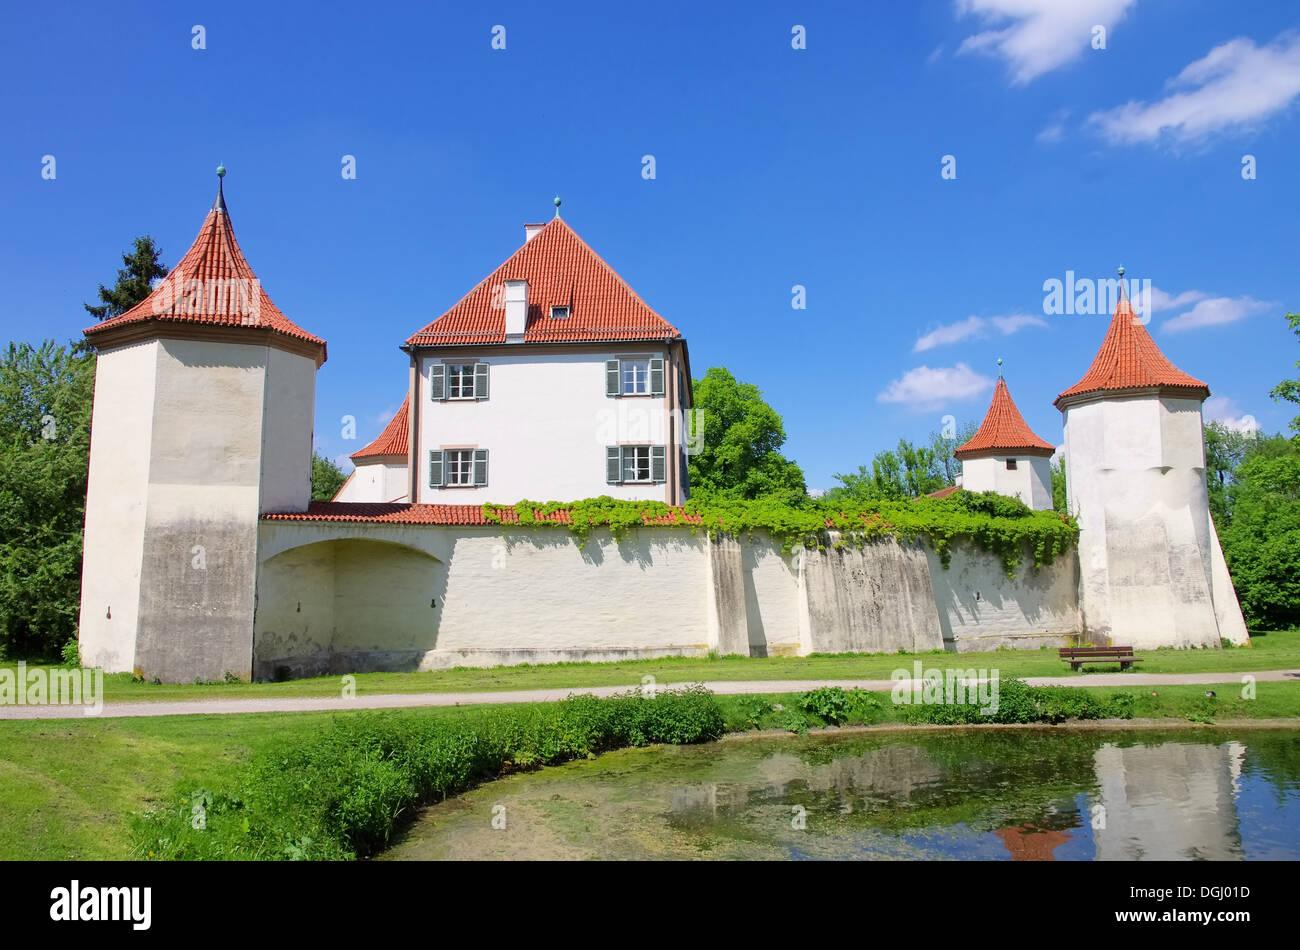 Muenchen Schloss Blutenburg - Munich palace Blutenburg 02 - Stock Image